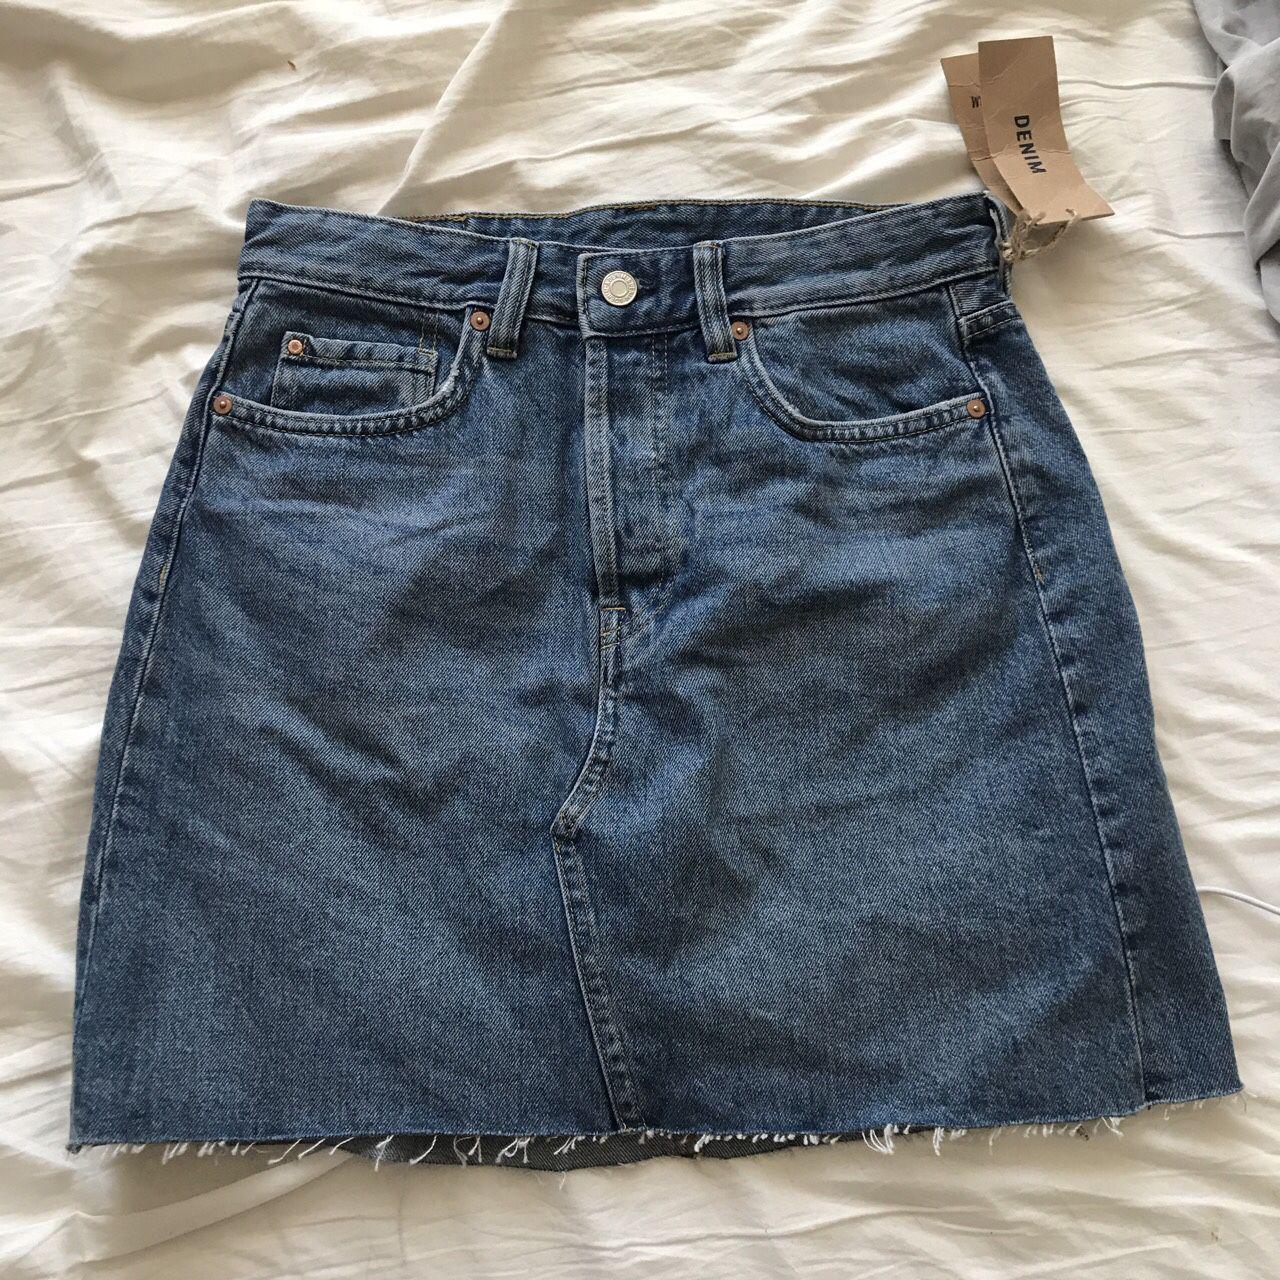 H&M jean skirt